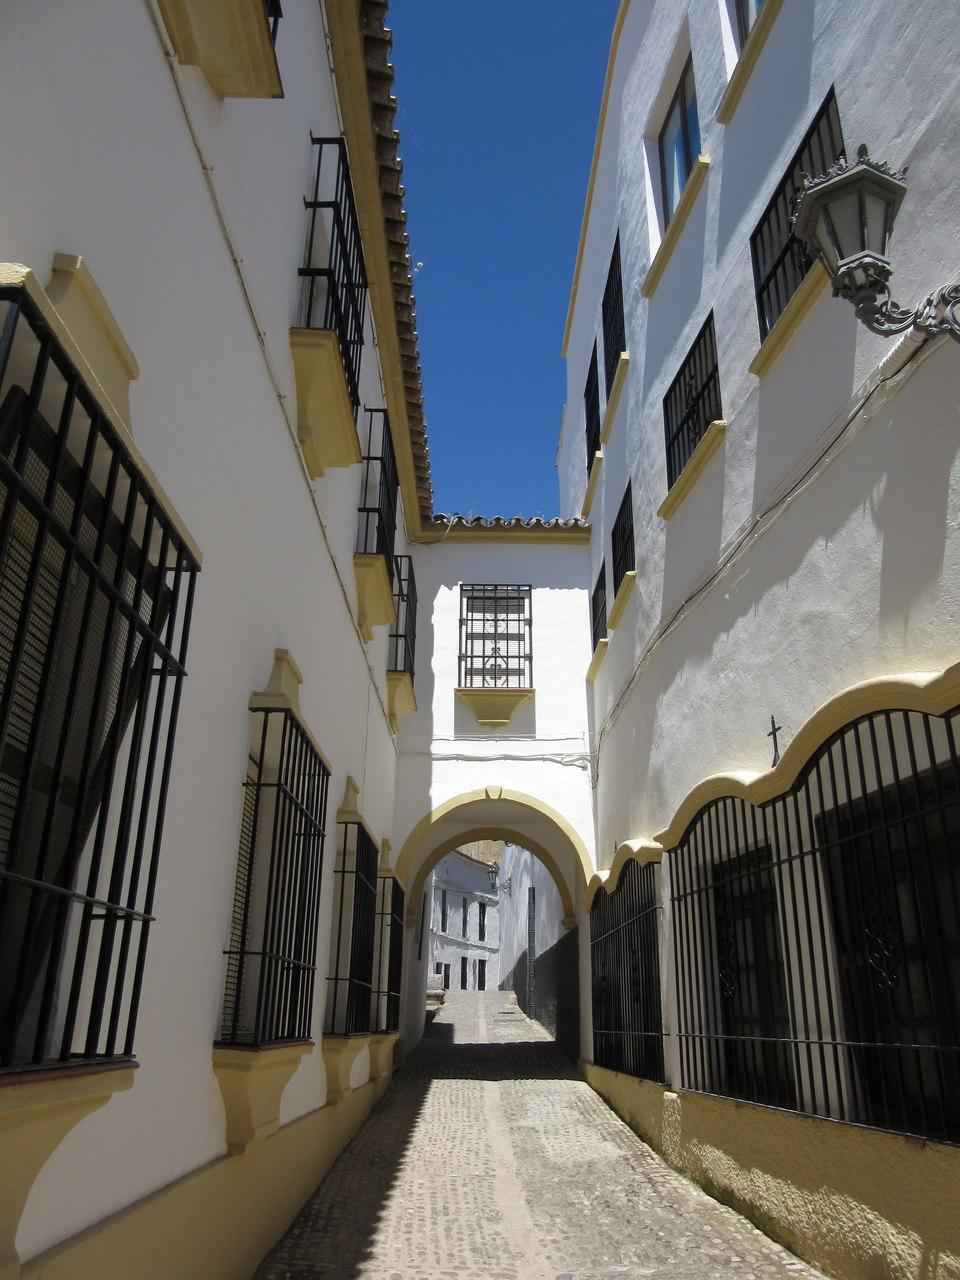 Backstreet in Ronda